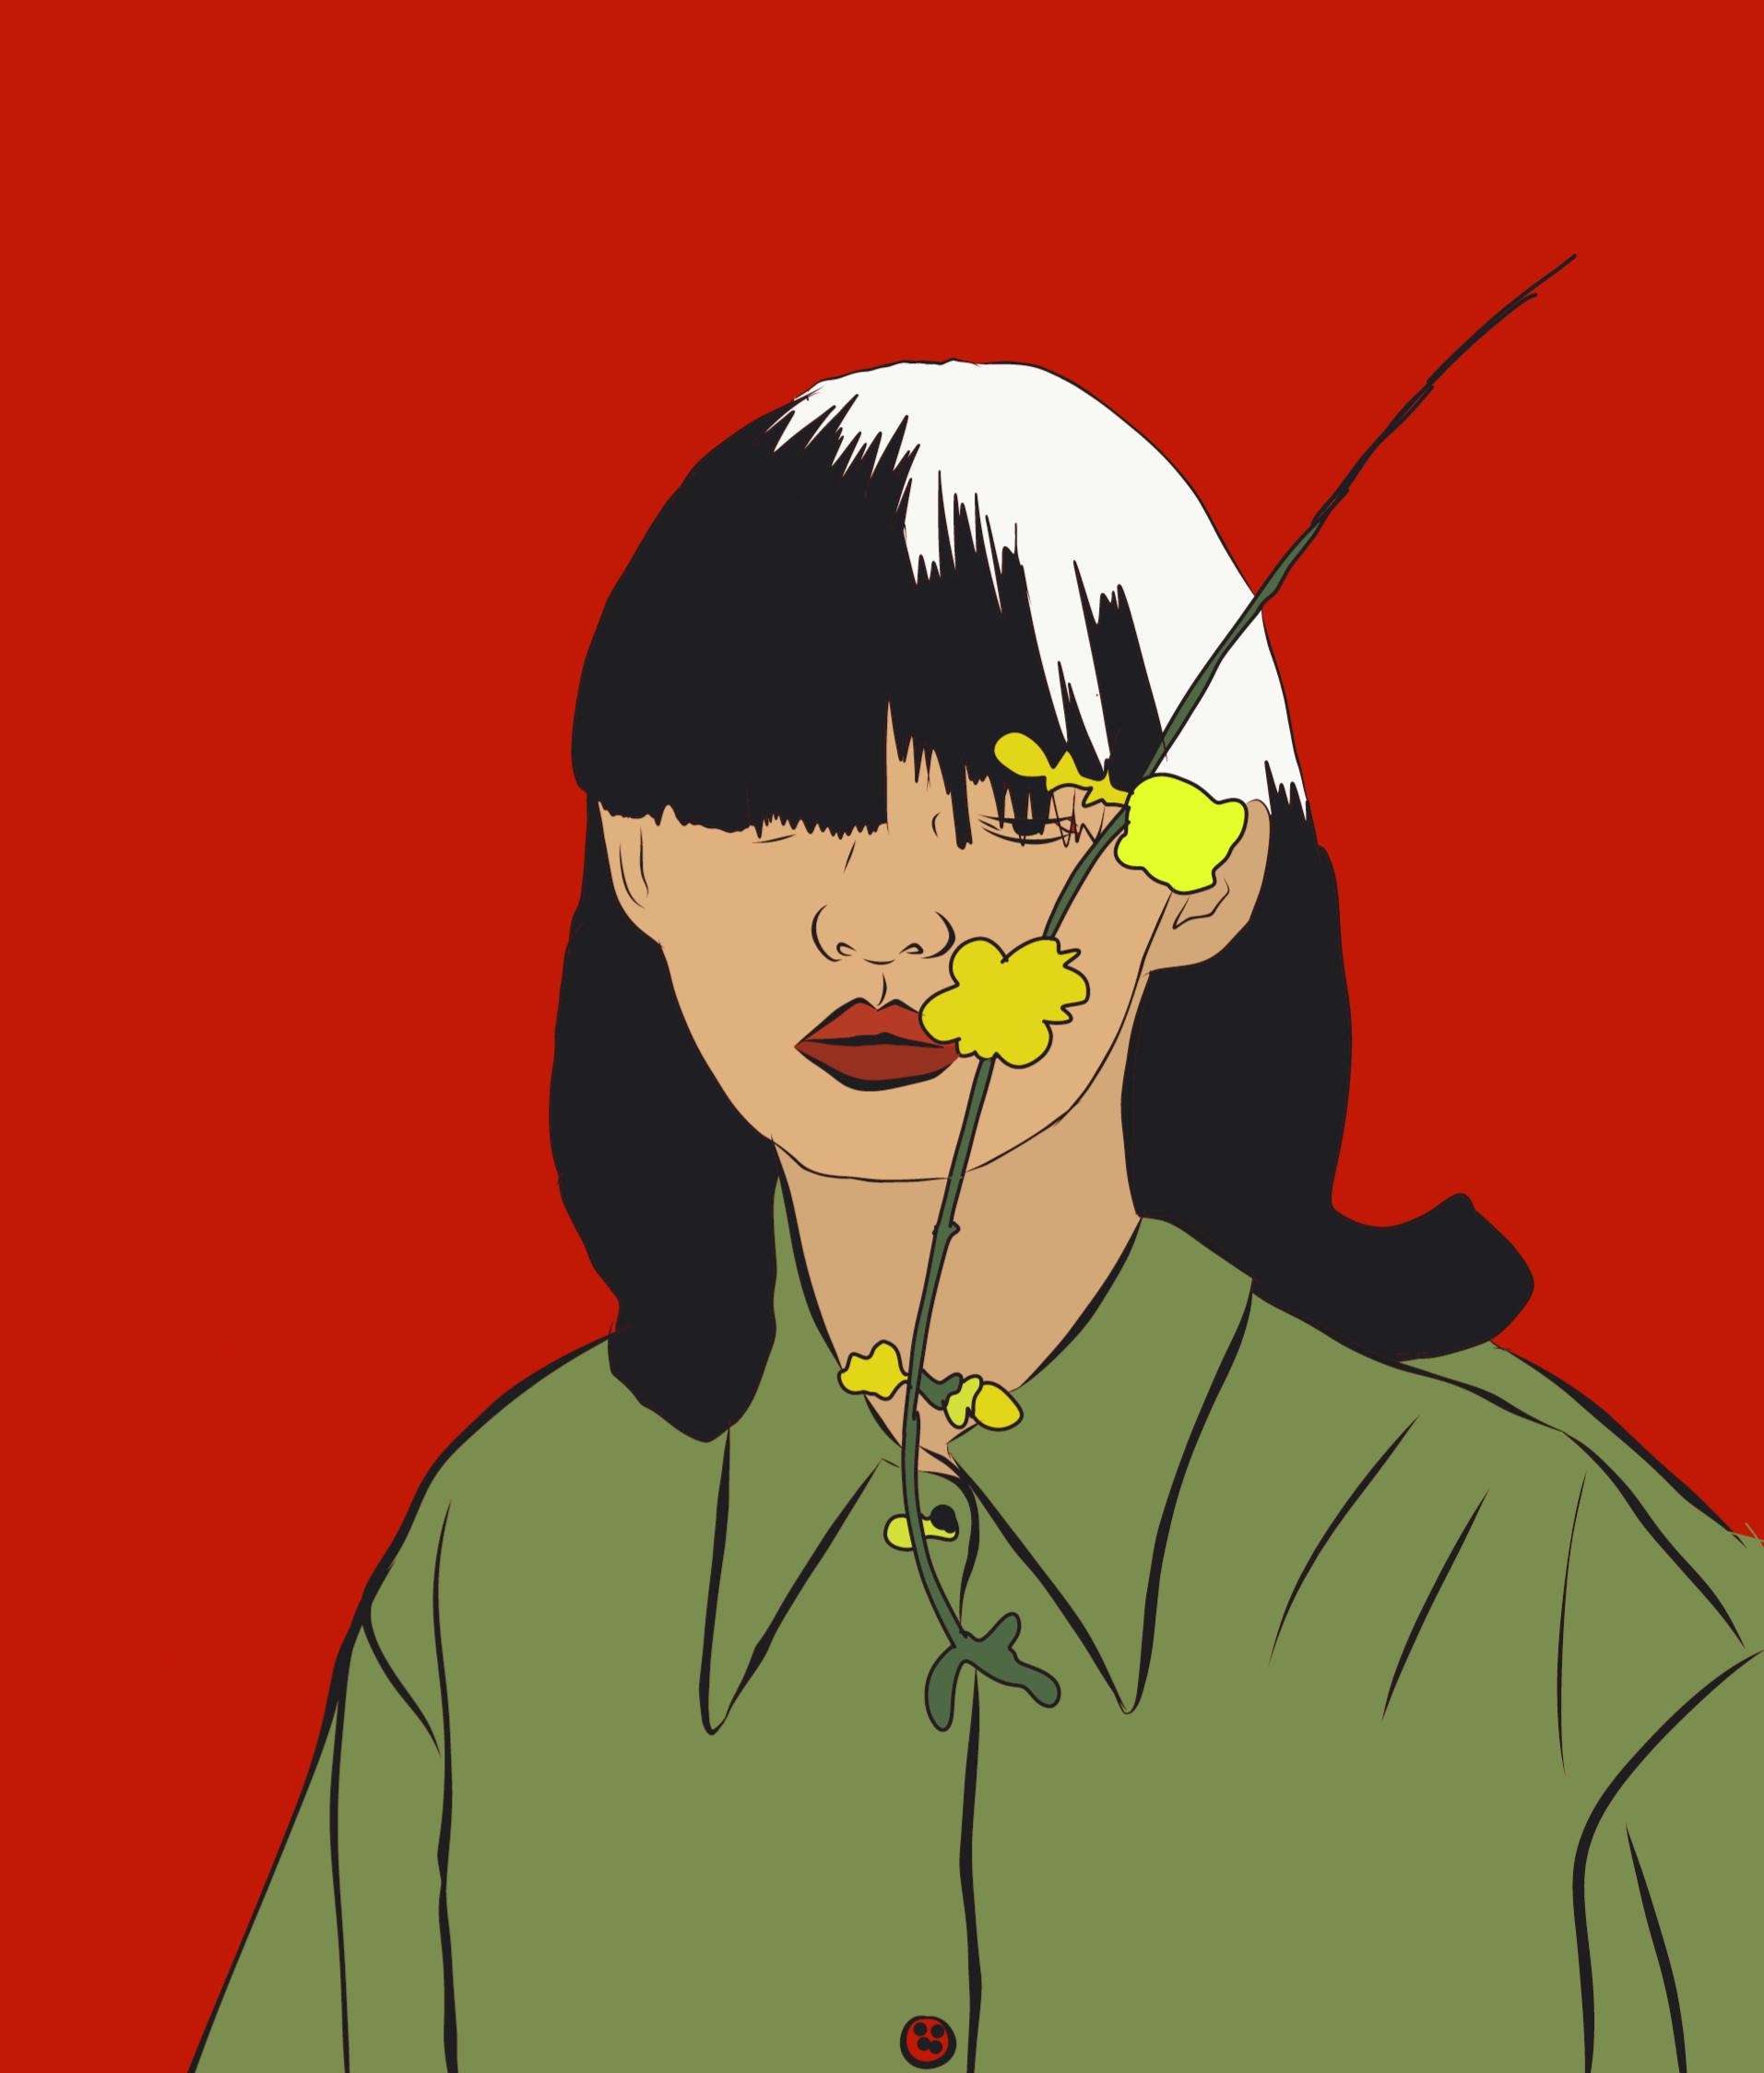 Creative portrait of a girl